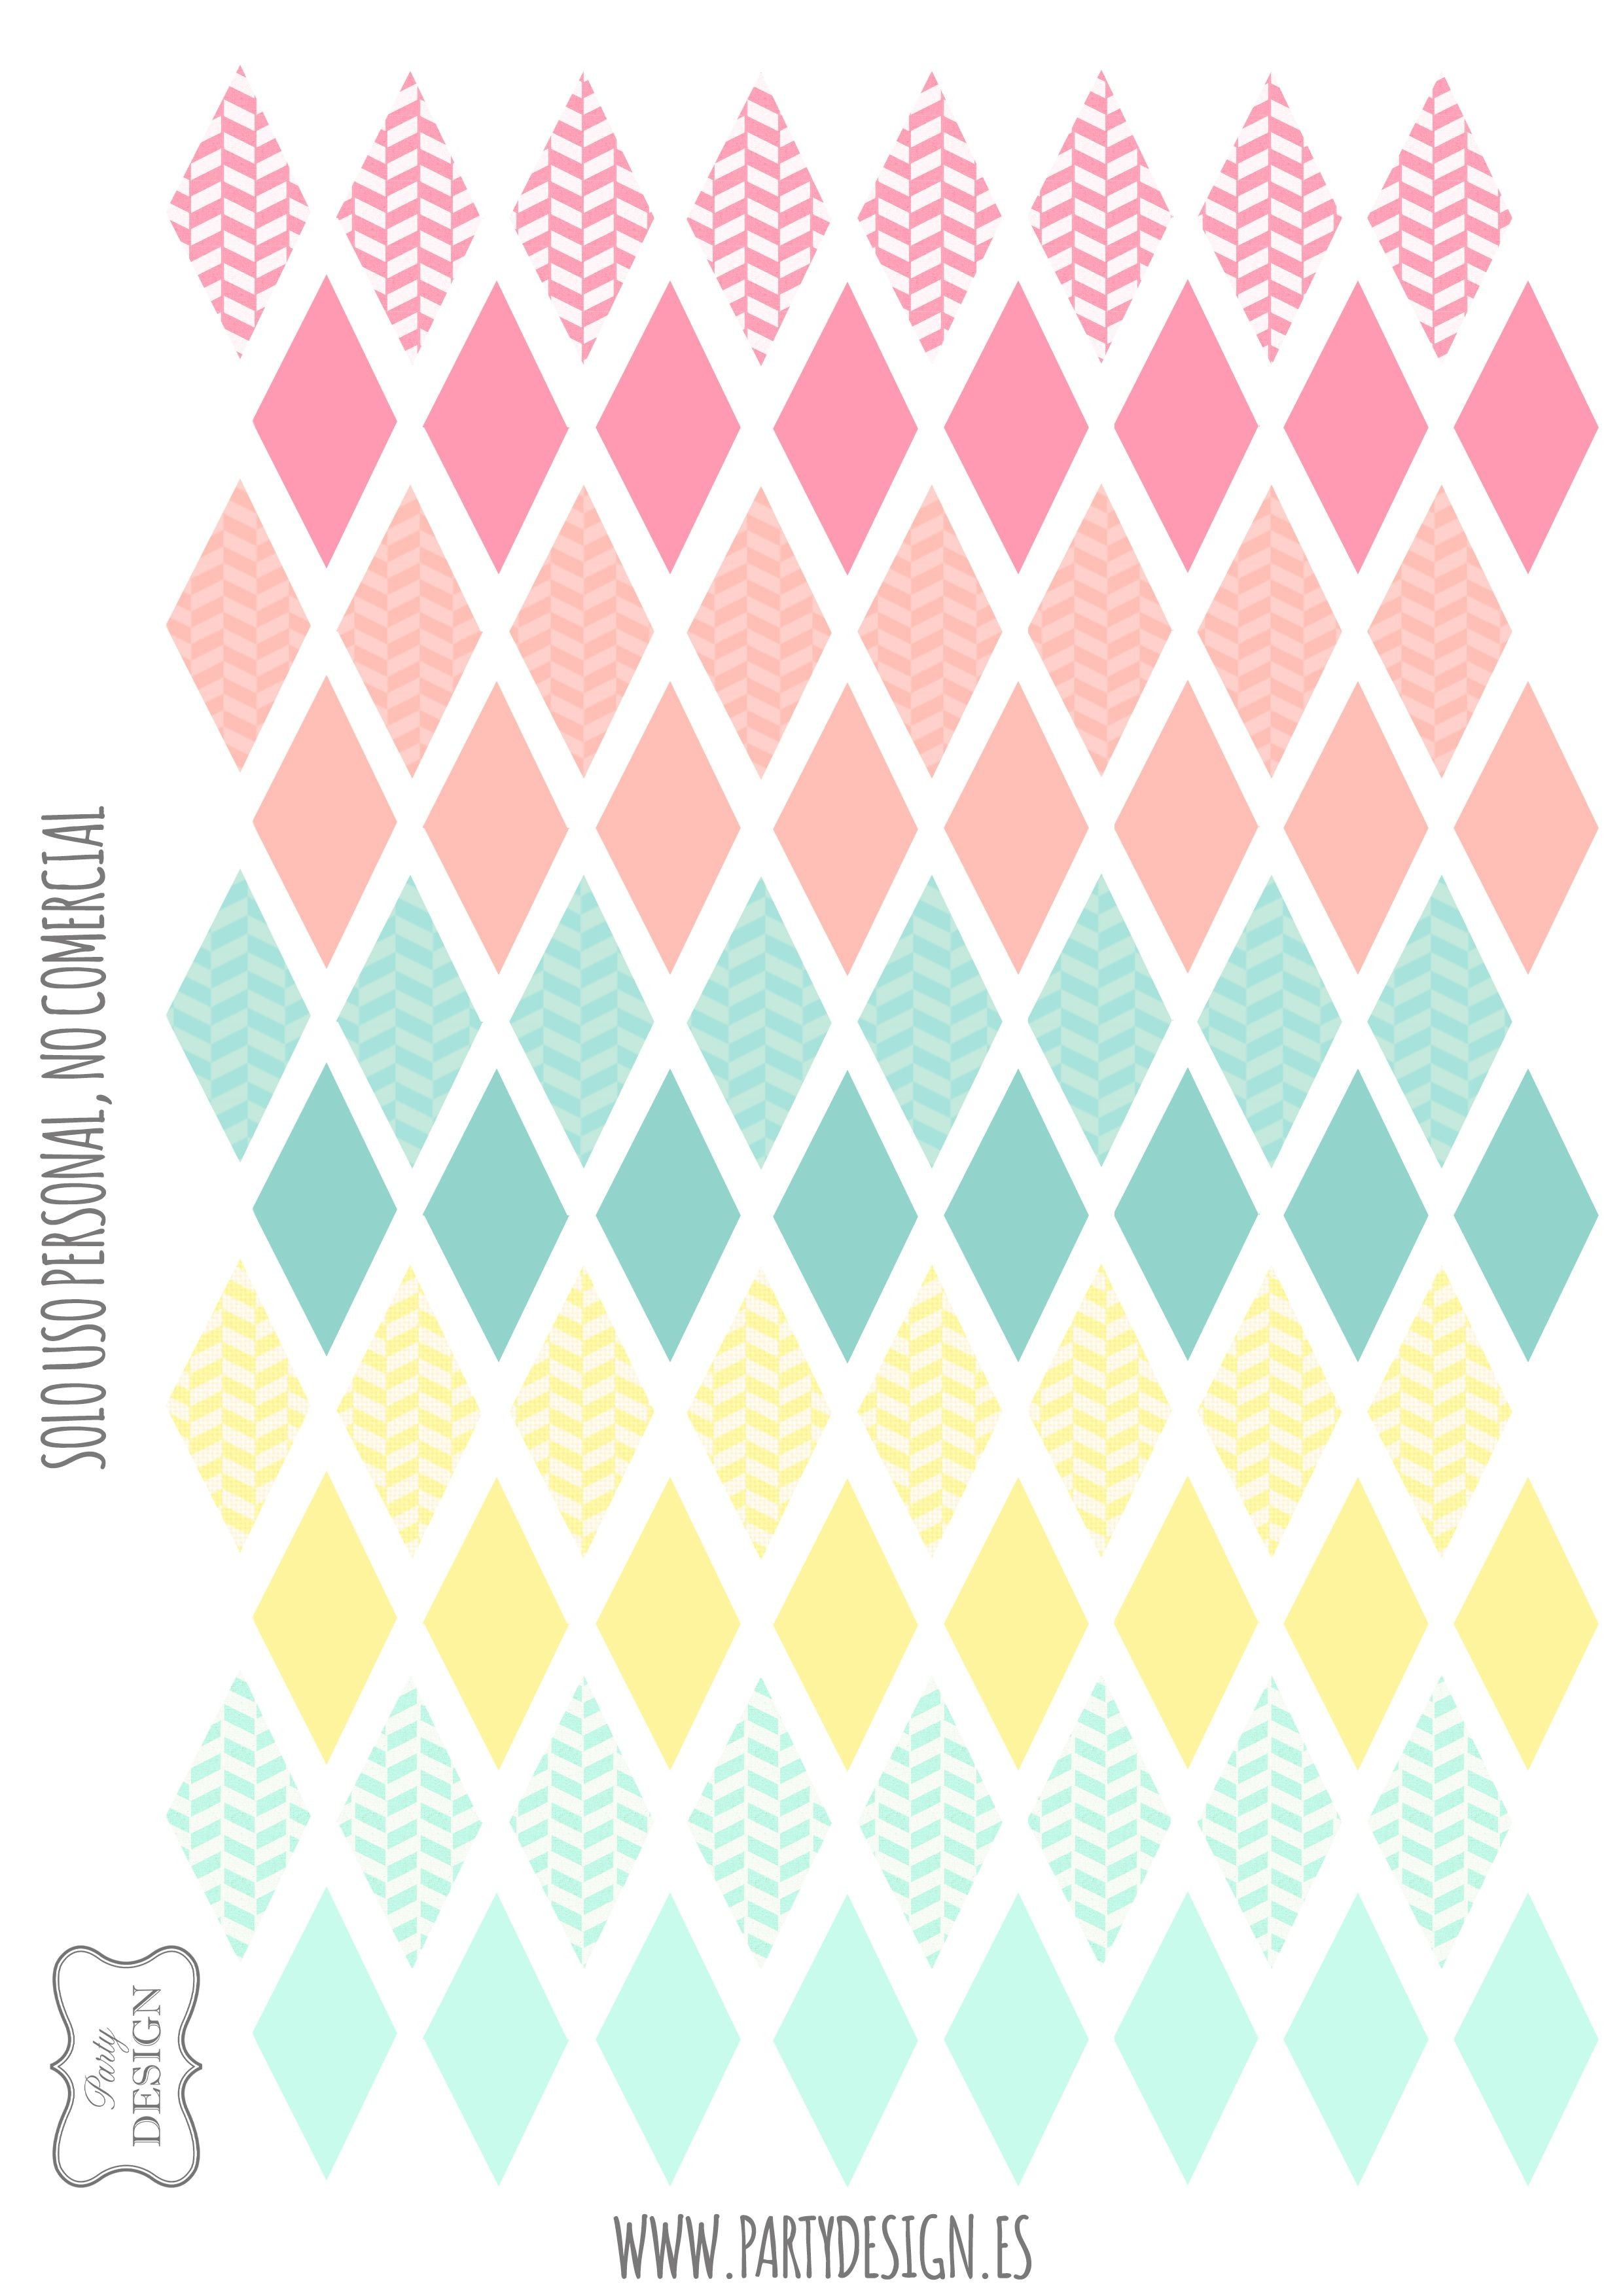 Pin by Dawn Kilgore on Printables